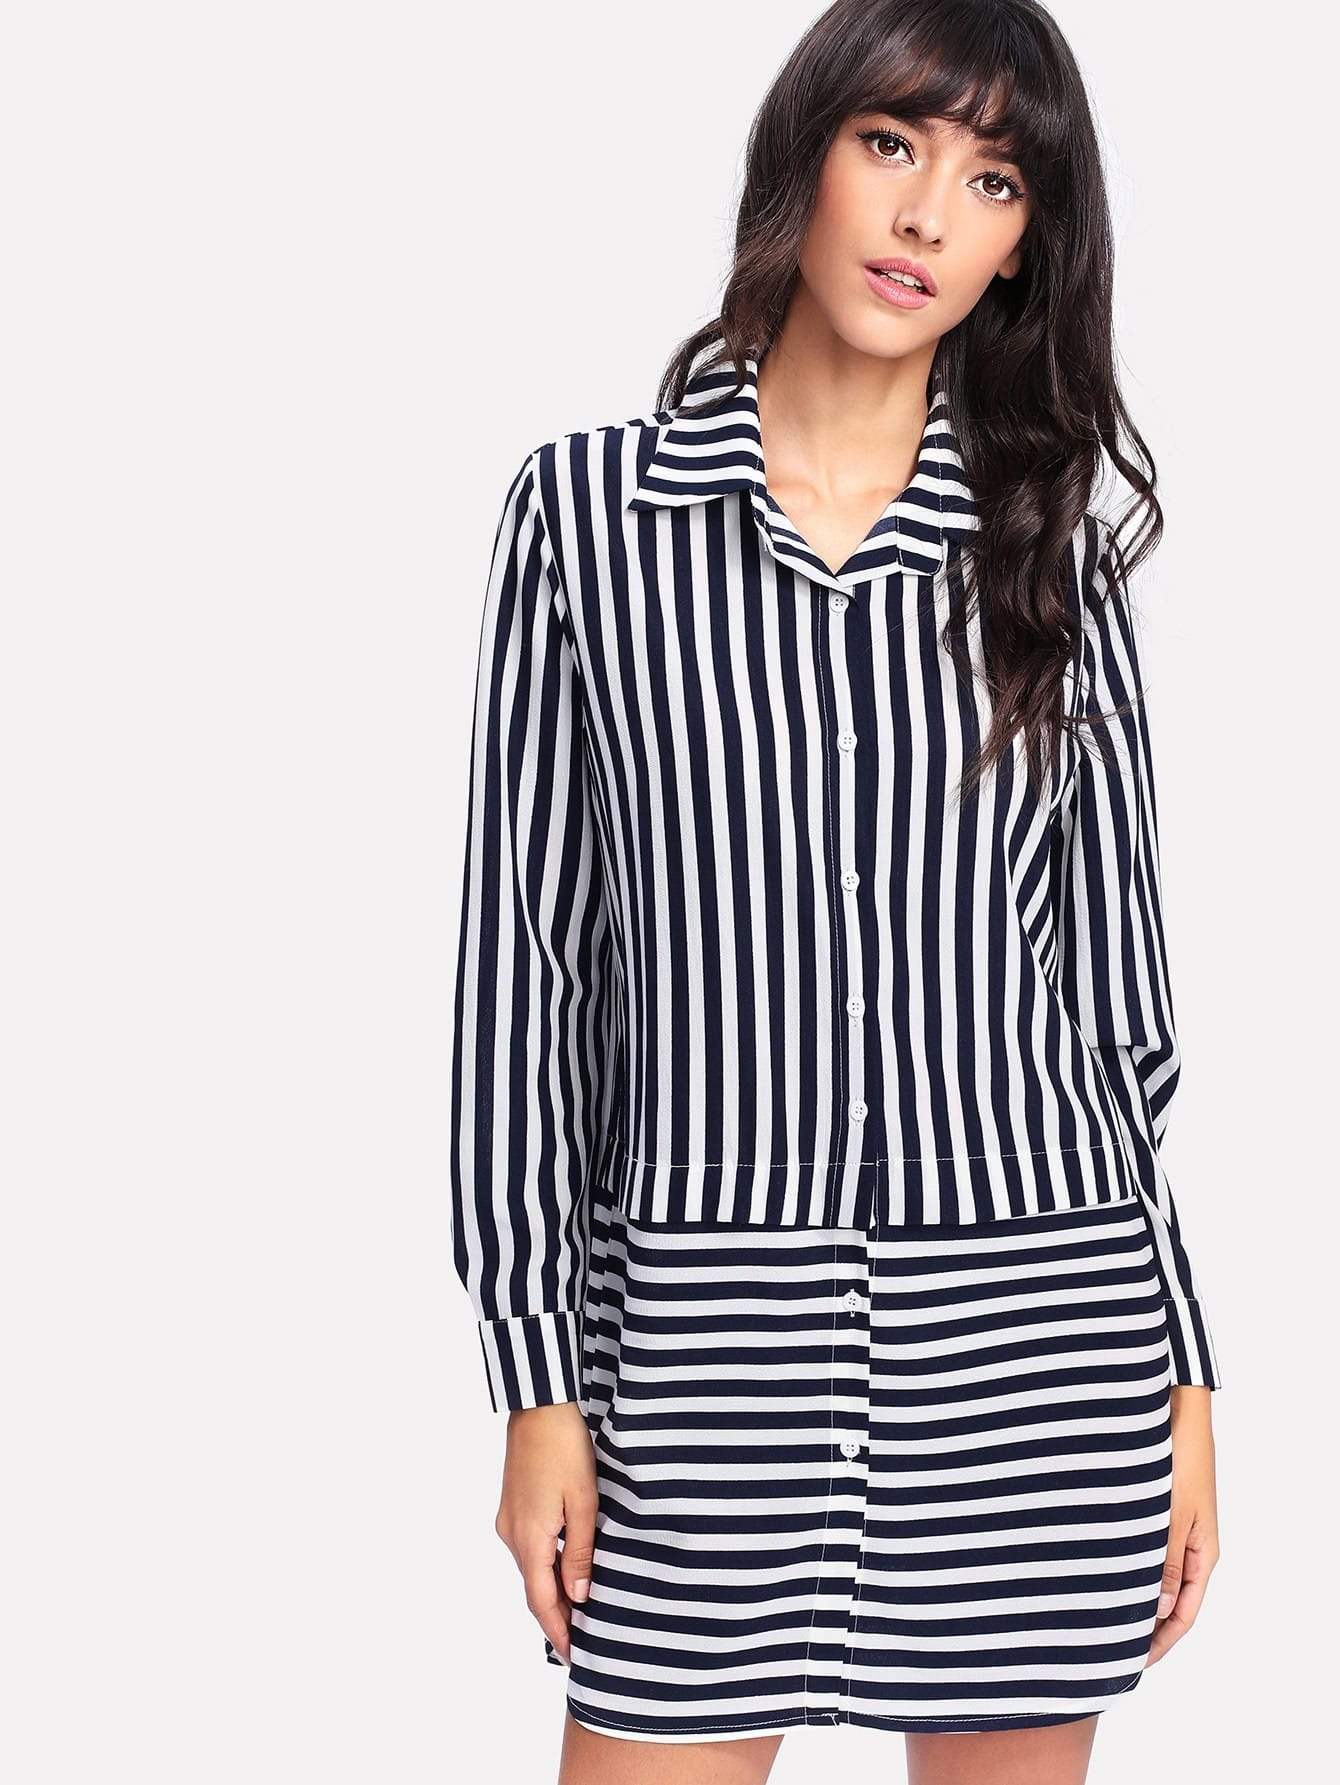 Contrast Striped Curved Hem Shirt Dress striped curved hem shirt dress